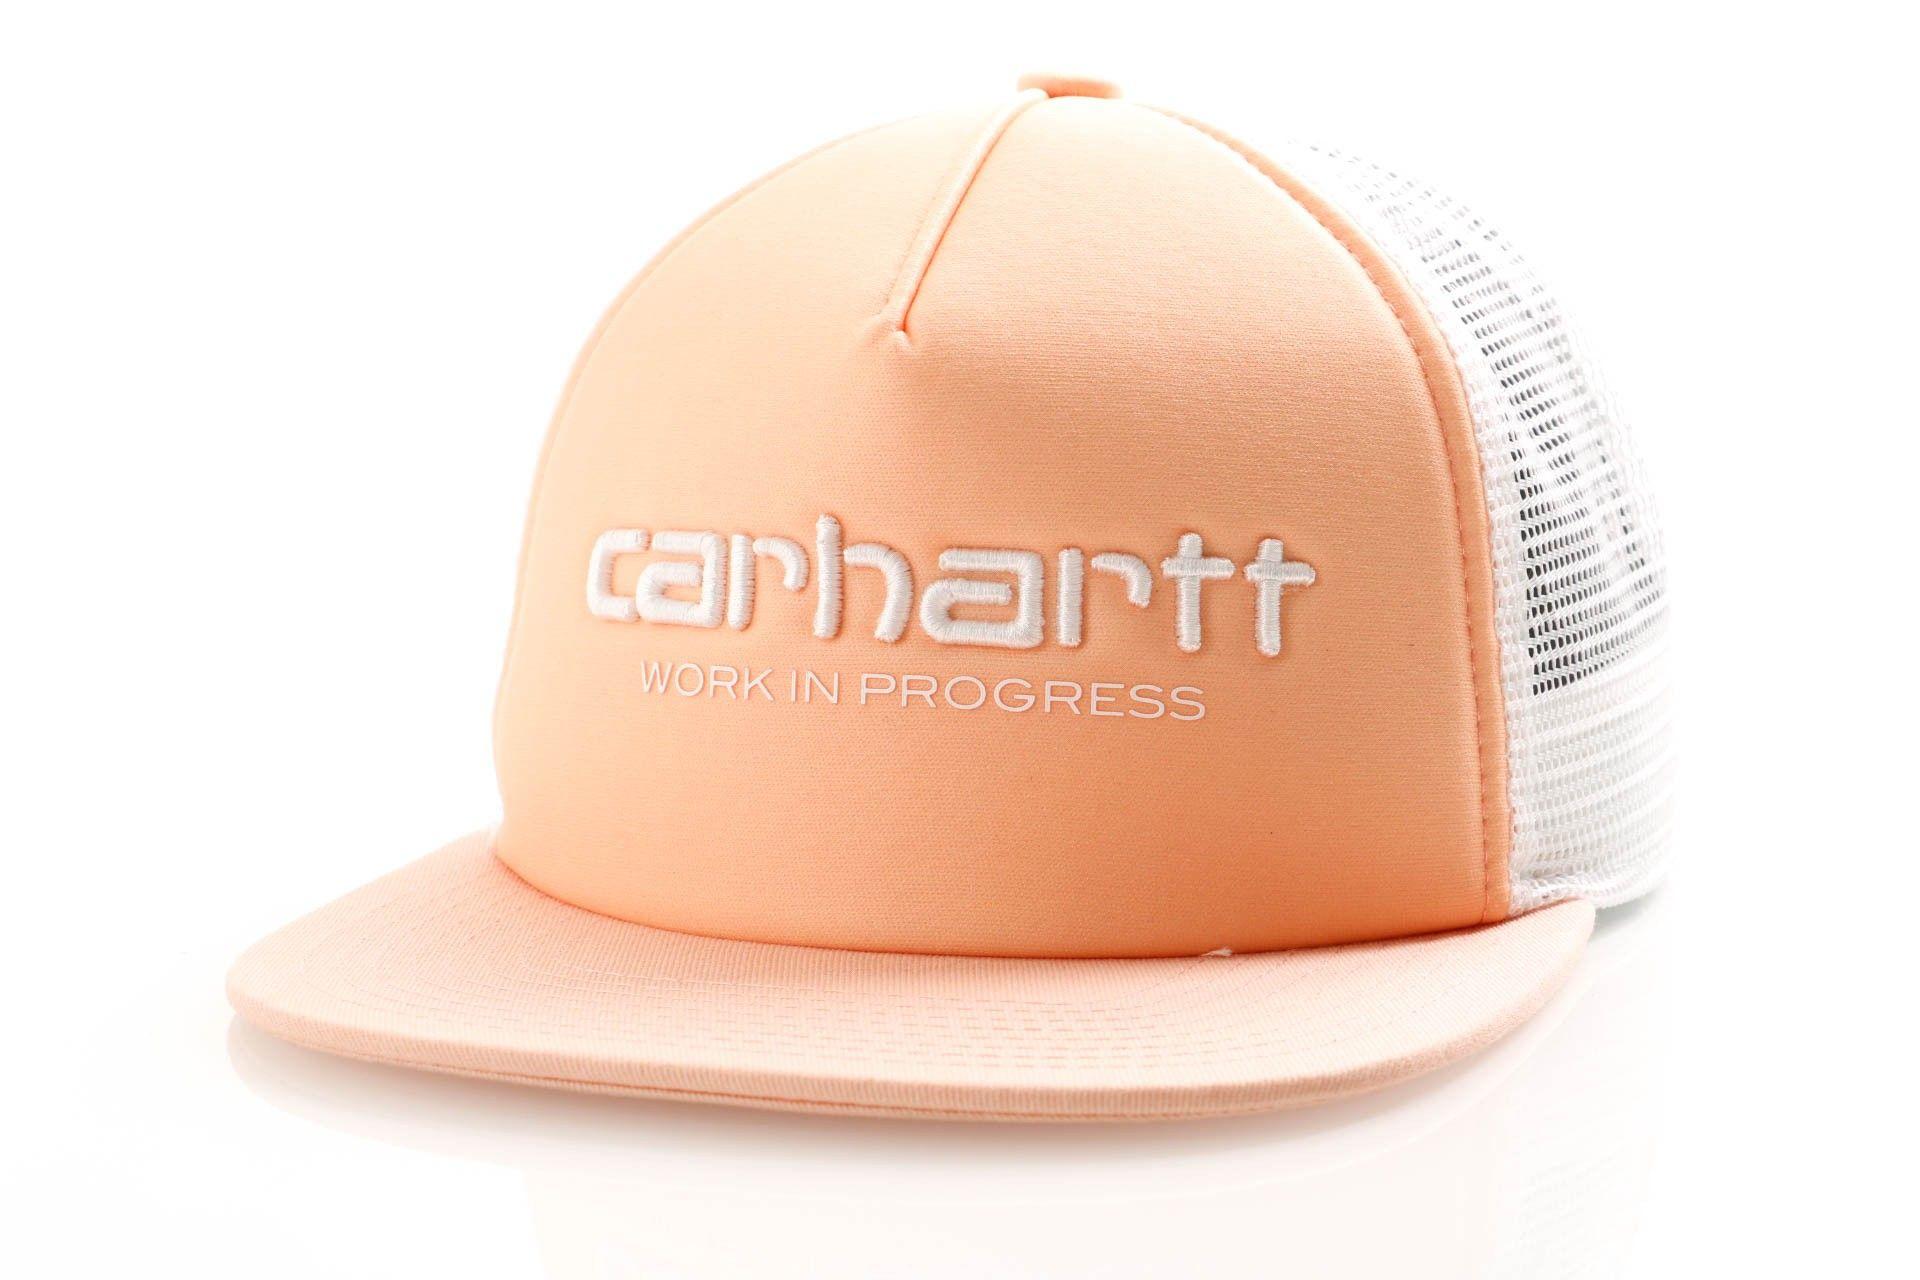 Afbeelding van Carhartt Wip Carhartt Wip Trucker Cap I026631 Trucker Cap Peach / White / White